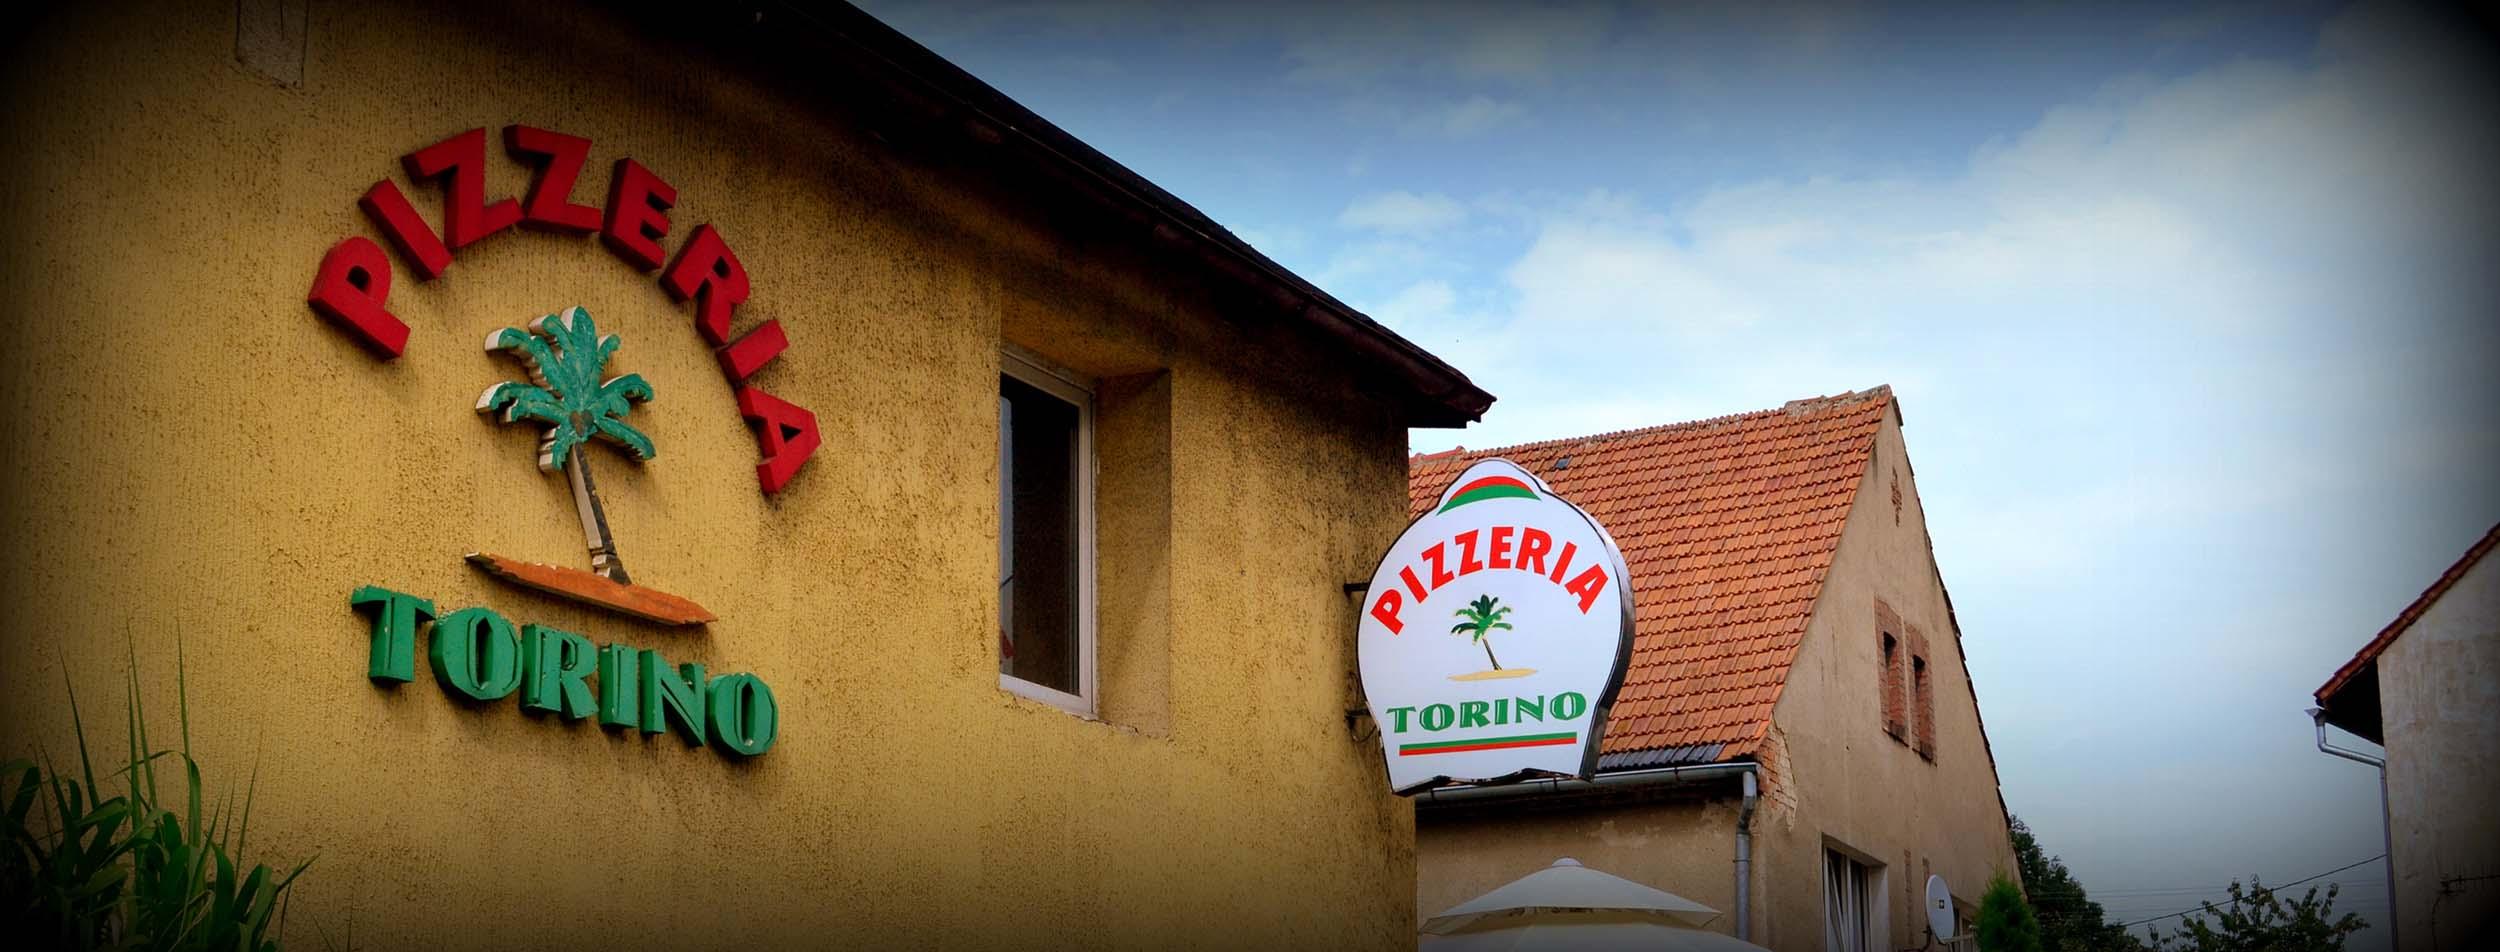 wejscie Torino